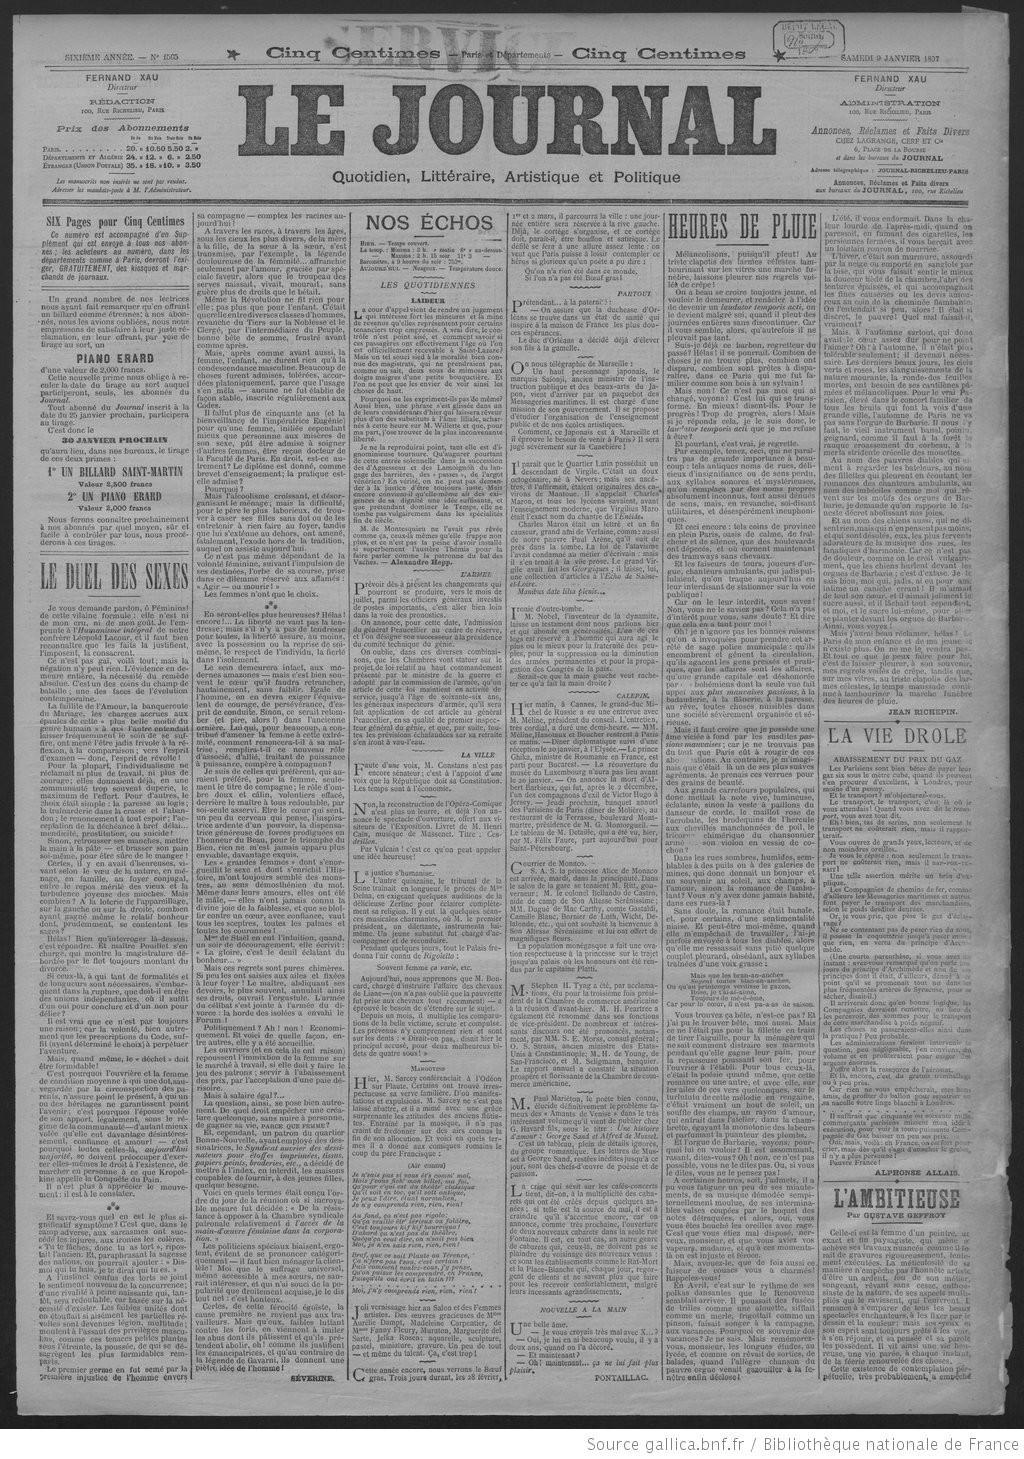 Le Journal   1897-01-09   Gallica 4cb9ec384776